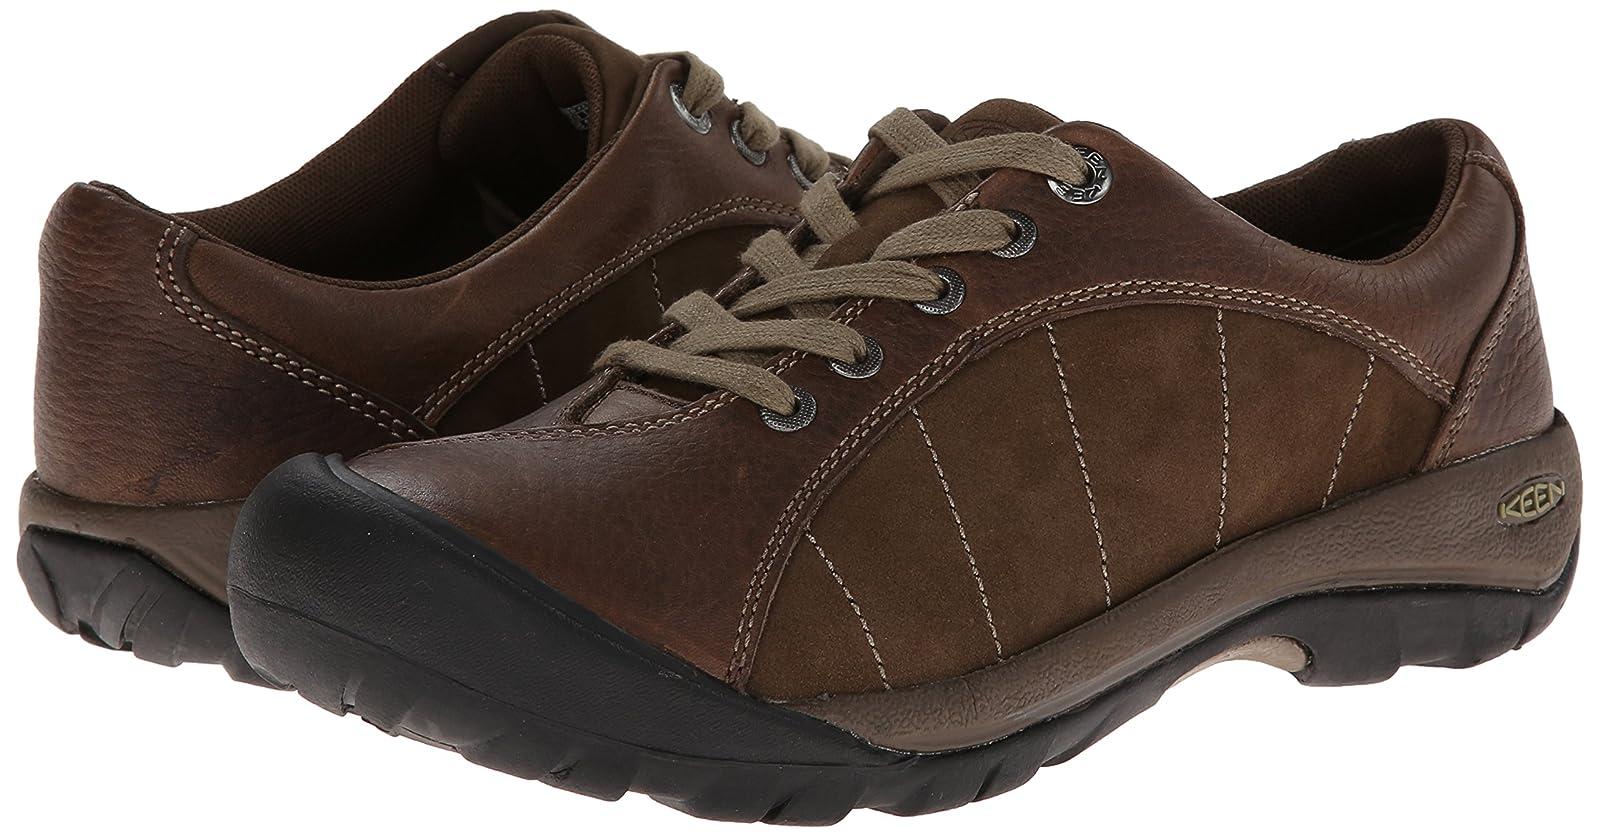 KEEN Women's Presidio Shoe Cascade Brown/Shitake 9.5 M US Women - 6